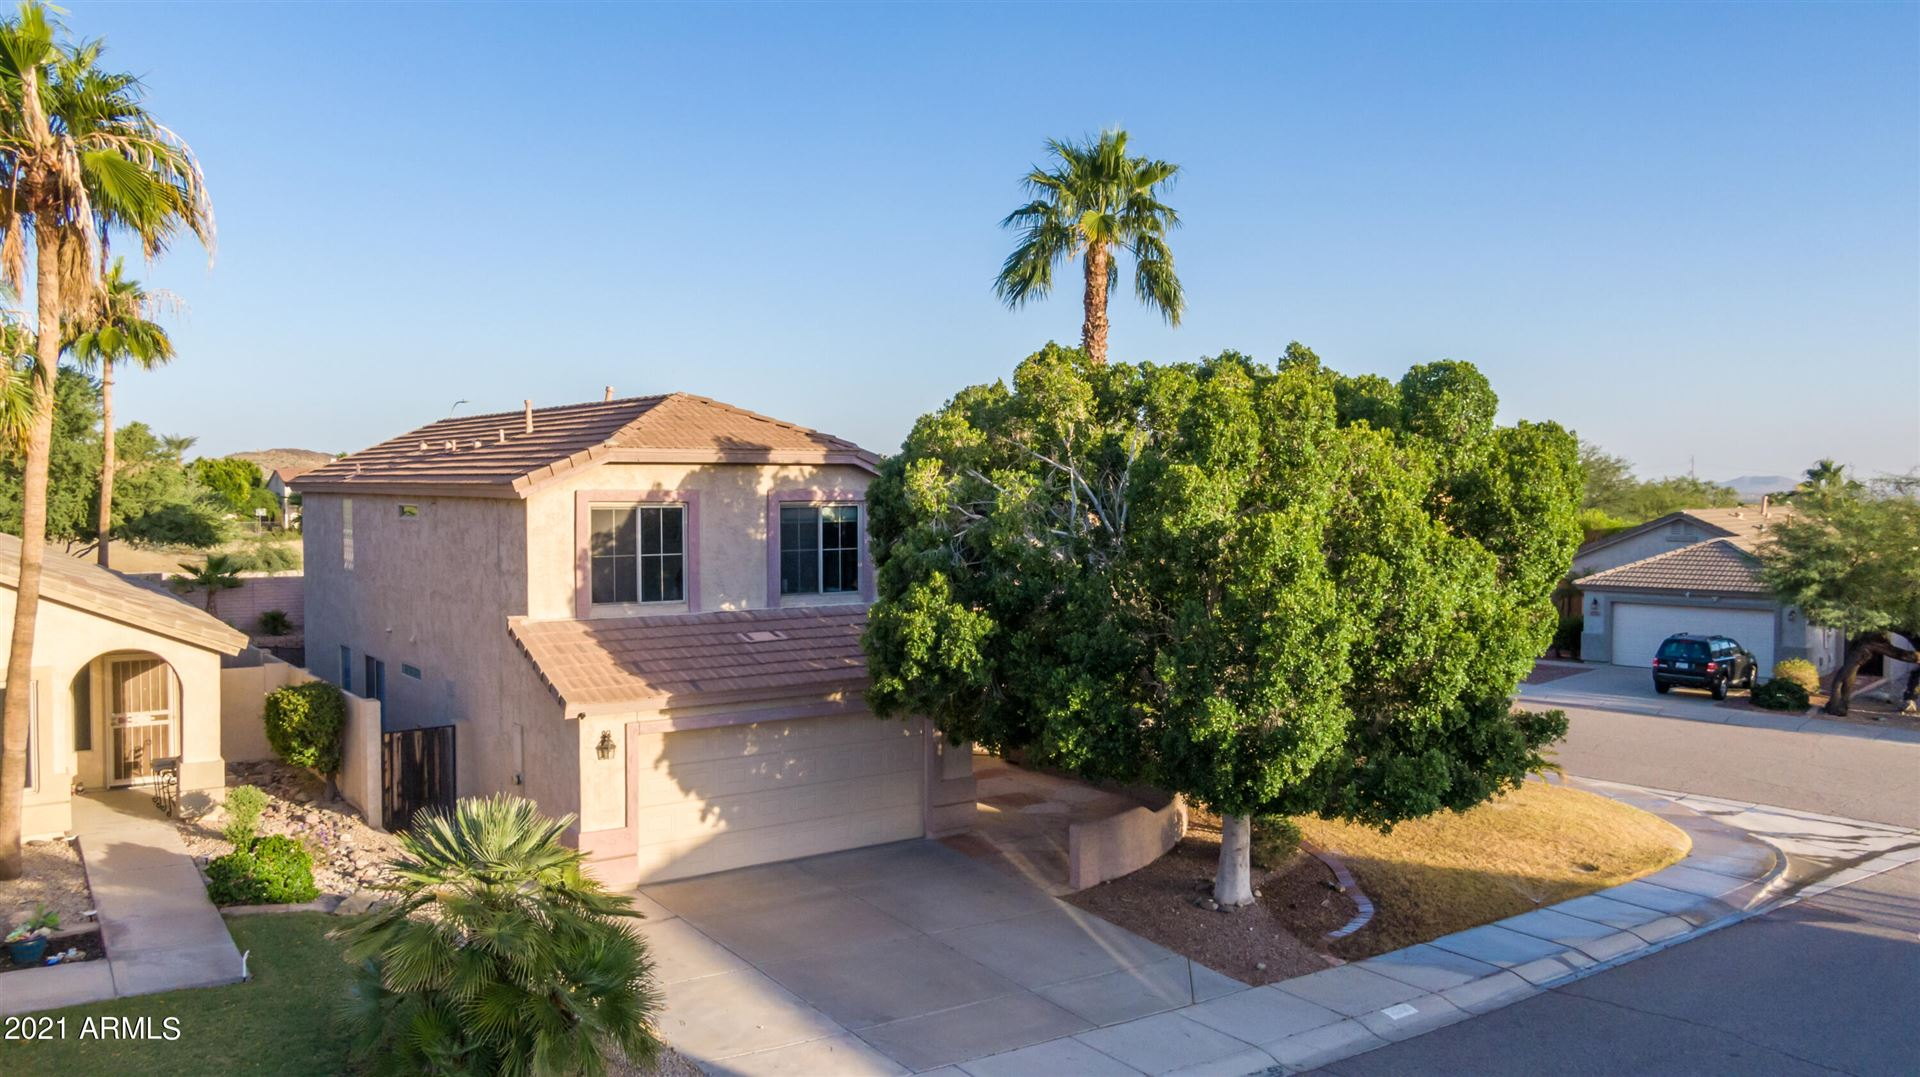 Photo of 16005 S 17TH Drive, Phoenix, AZ 85045 (MLS # 6307751)